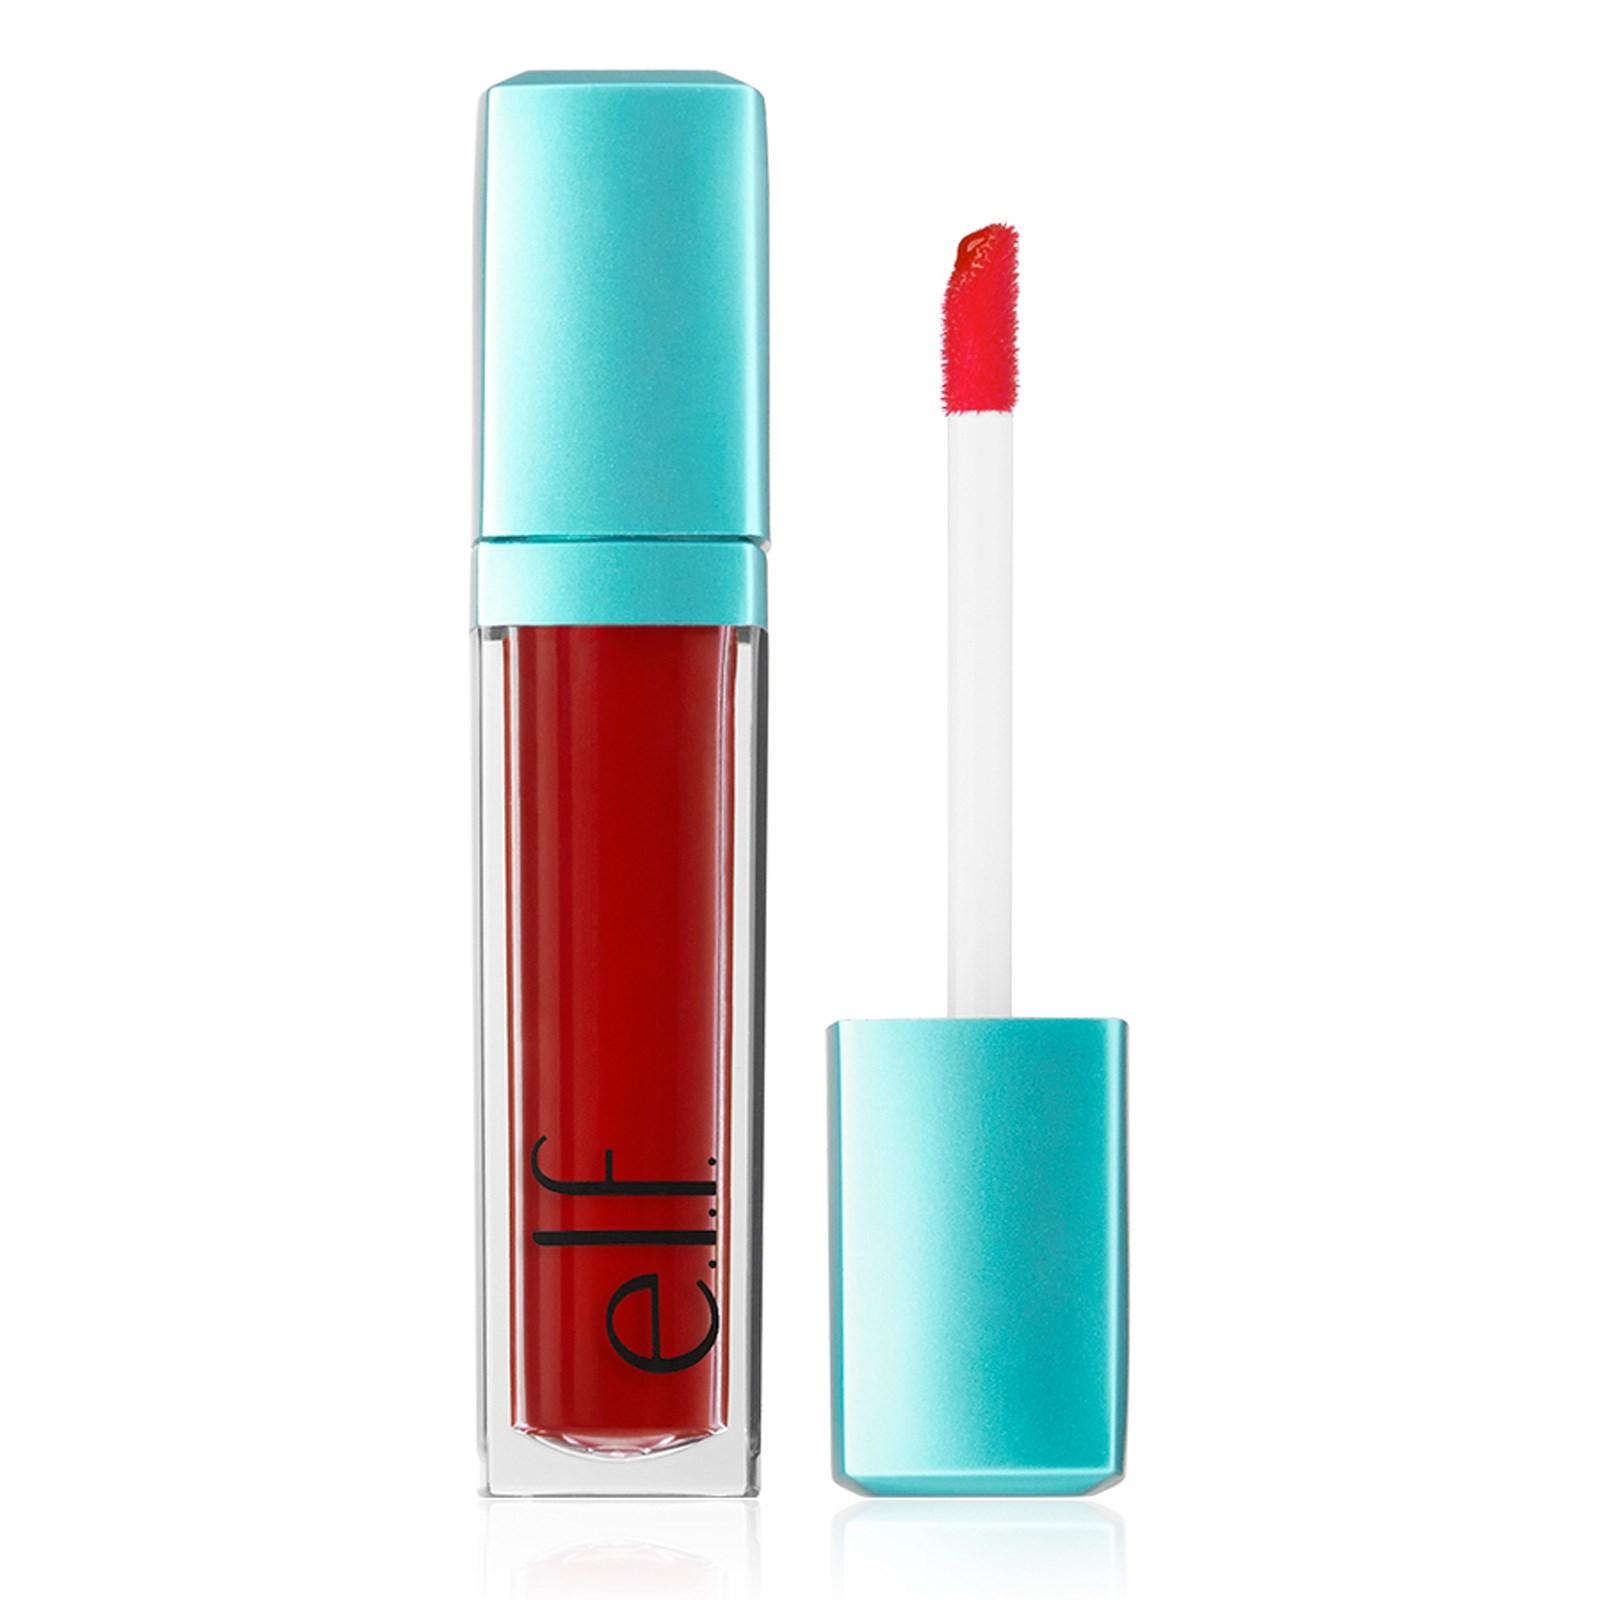 E.L.F. Cosmetics, Водная красота, сияющий оттеночный гель для губ, Red Orange Wash, 0,20 ж. унц. (6 мл)